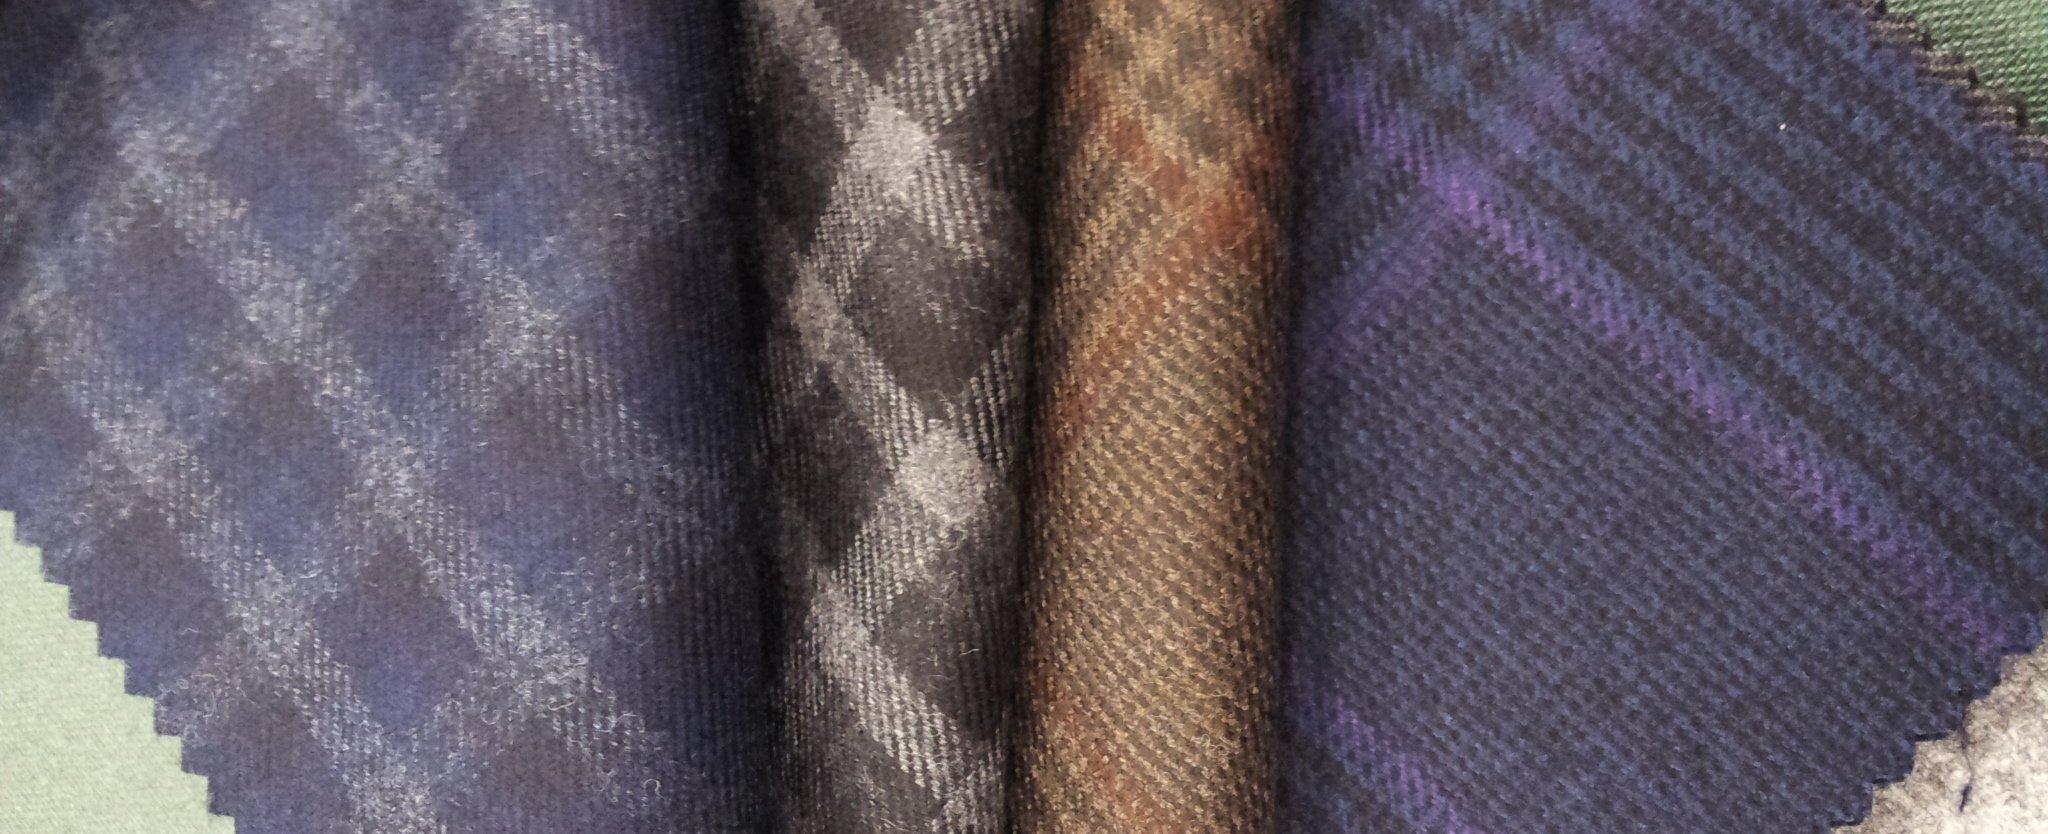 Dormeuil tessuti in lana pettinata per Giacche ~ Sartoria Scavelli Roma